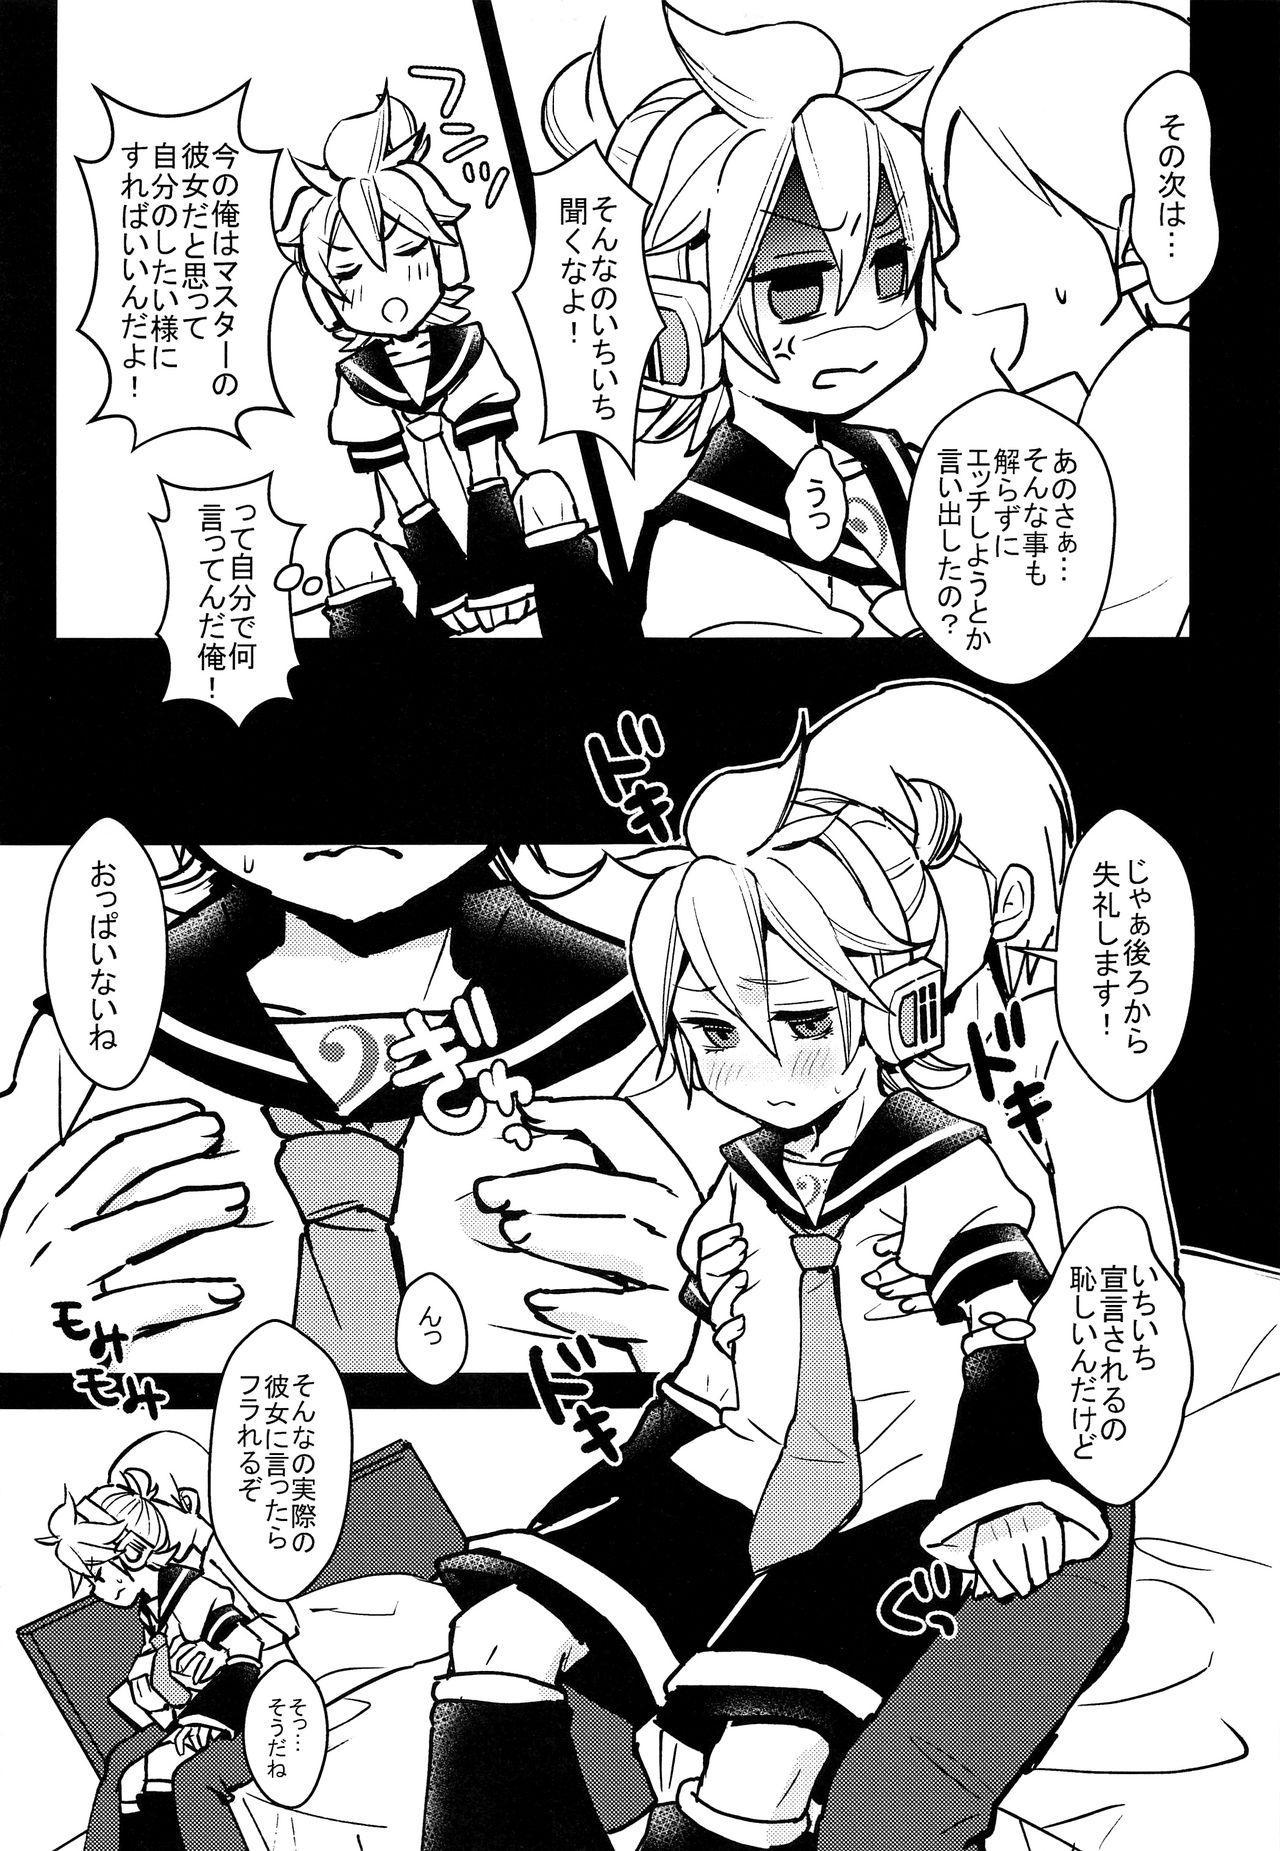 Len-kun Onegai! 11